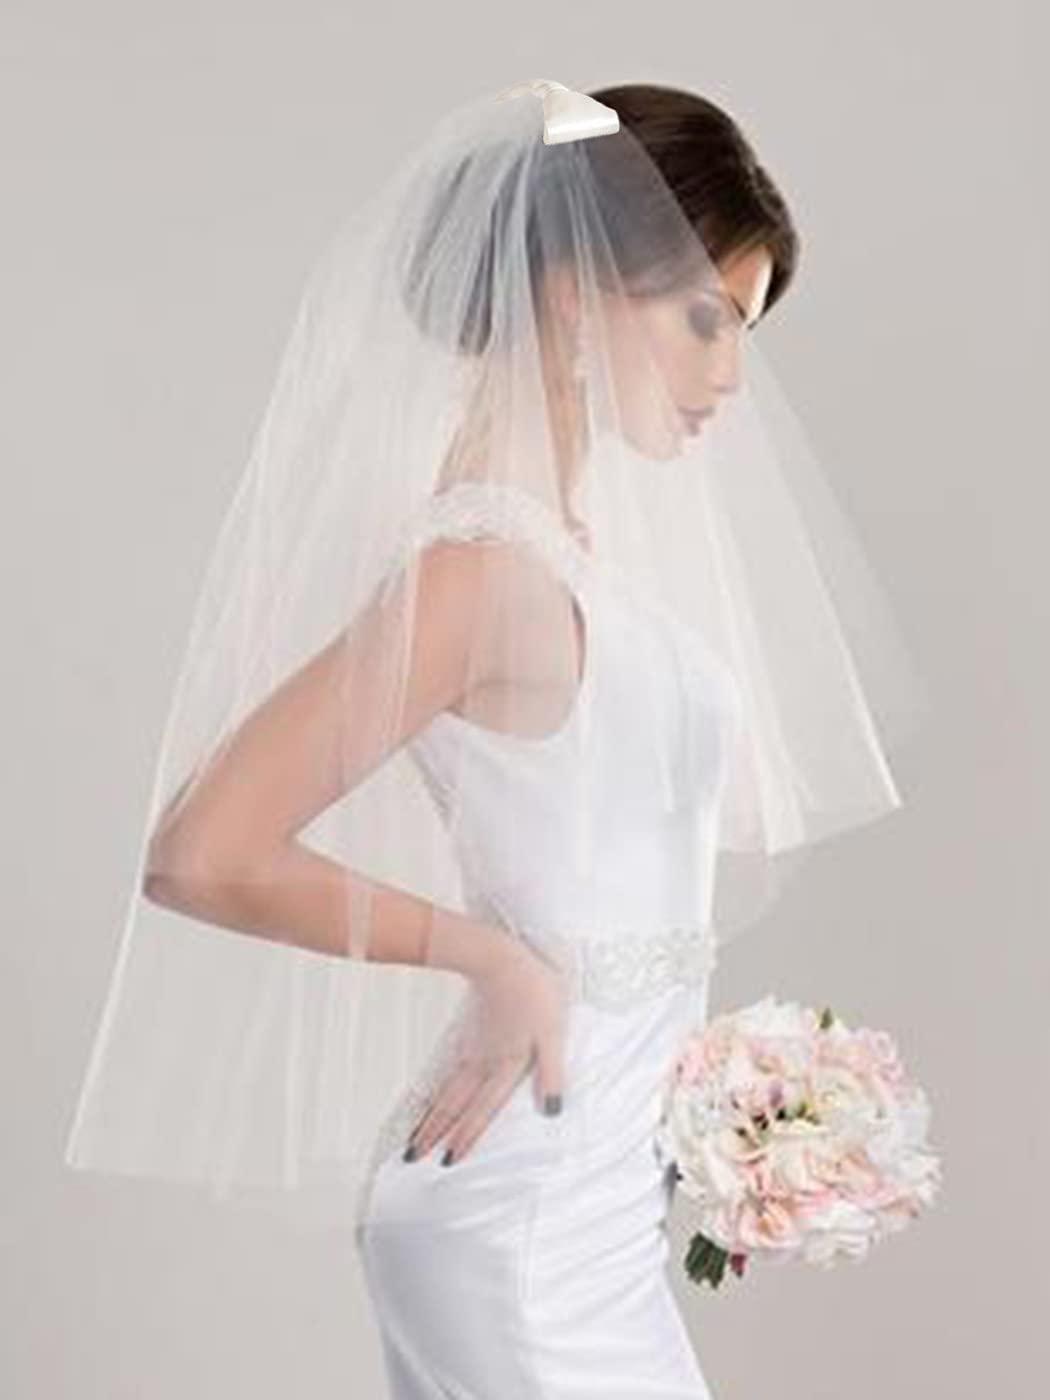 Yokawe Women's Bridal Wedding Veil 2 Tier Bow Bride Veils with Comb White Wedding Headpiece (Ivory)